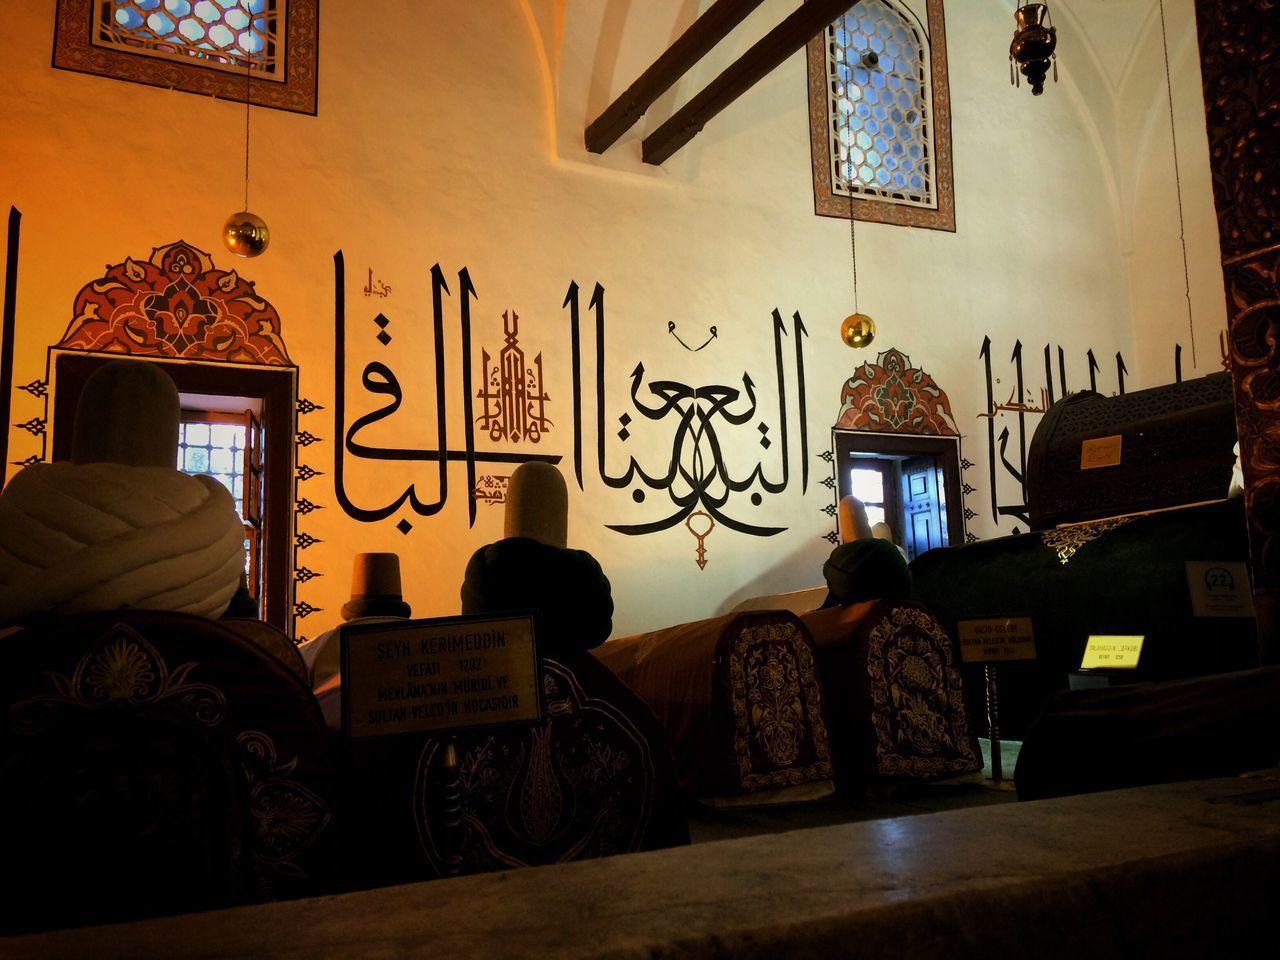 Retro Konya Turkey Arts Culture And Entertainment Turkey Konya Mevlana Mosque Mevlana Türbesi Love ♥ Elégance Vintage History